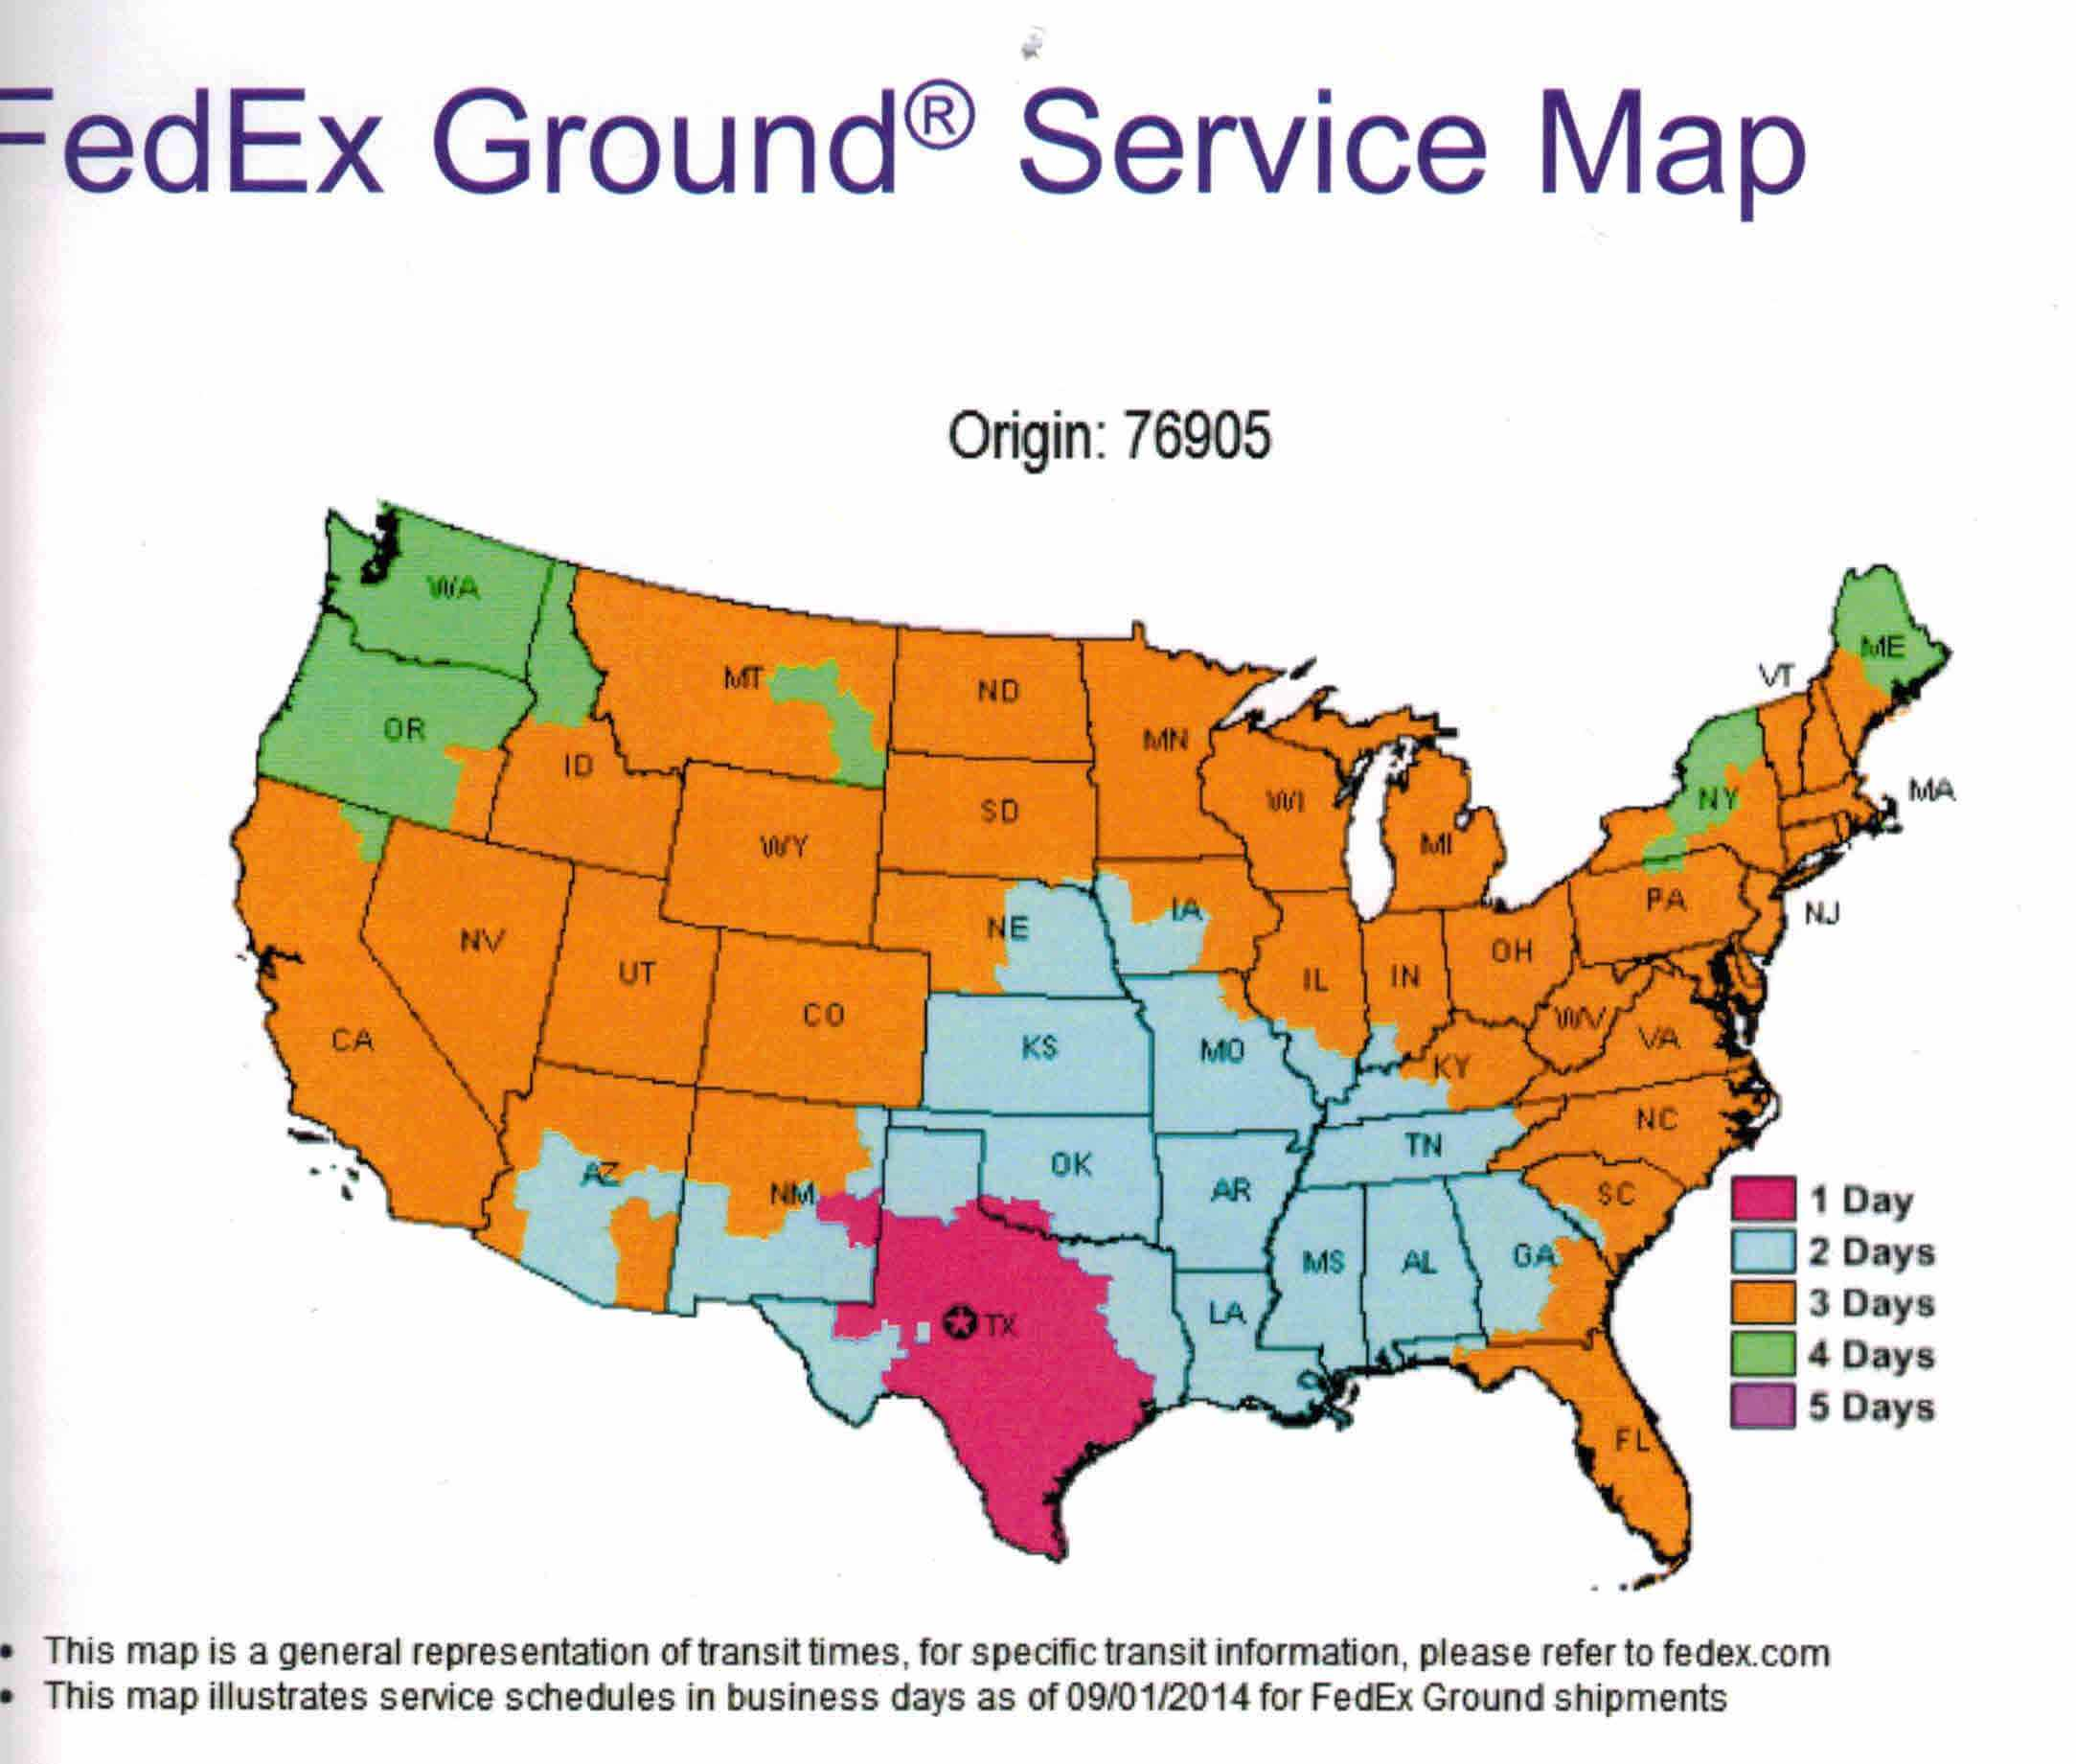 fedex state map walt disney world state map kroger state map